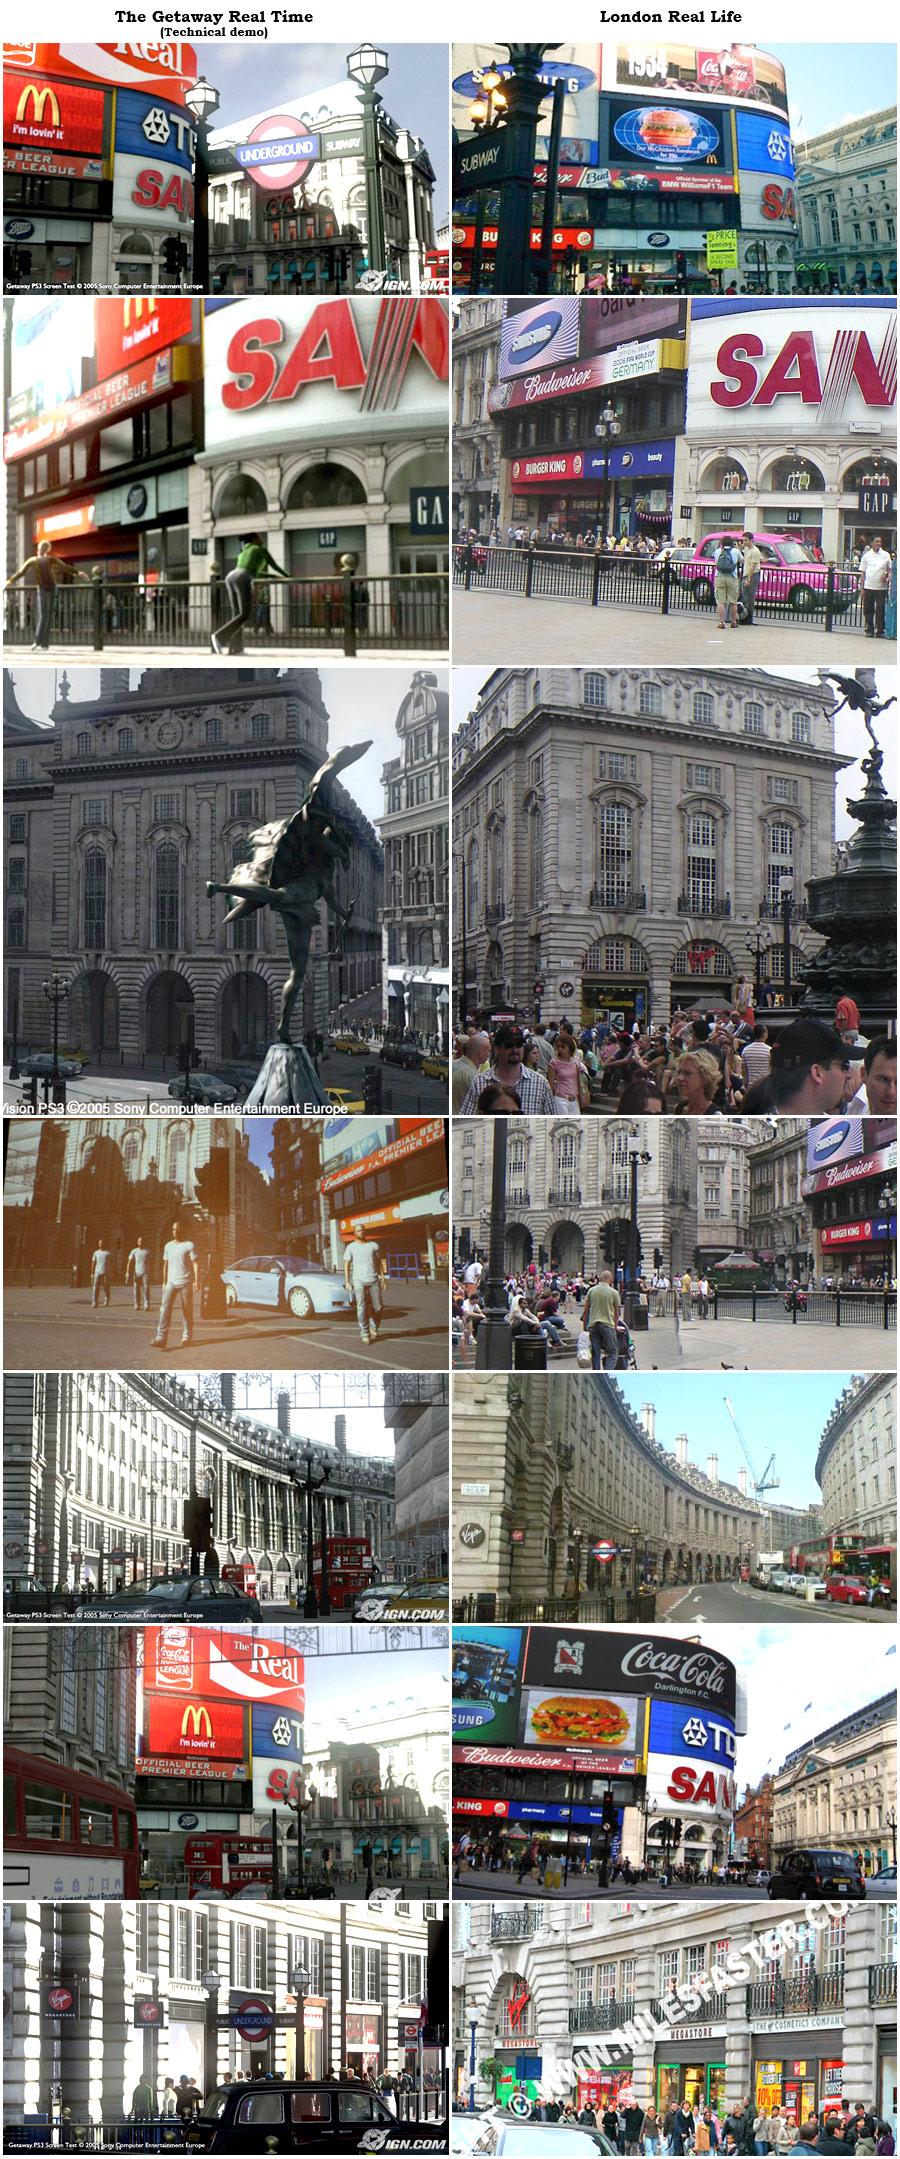 getawaycompa.jpg (JPEG Image, 900x2159 pixels)